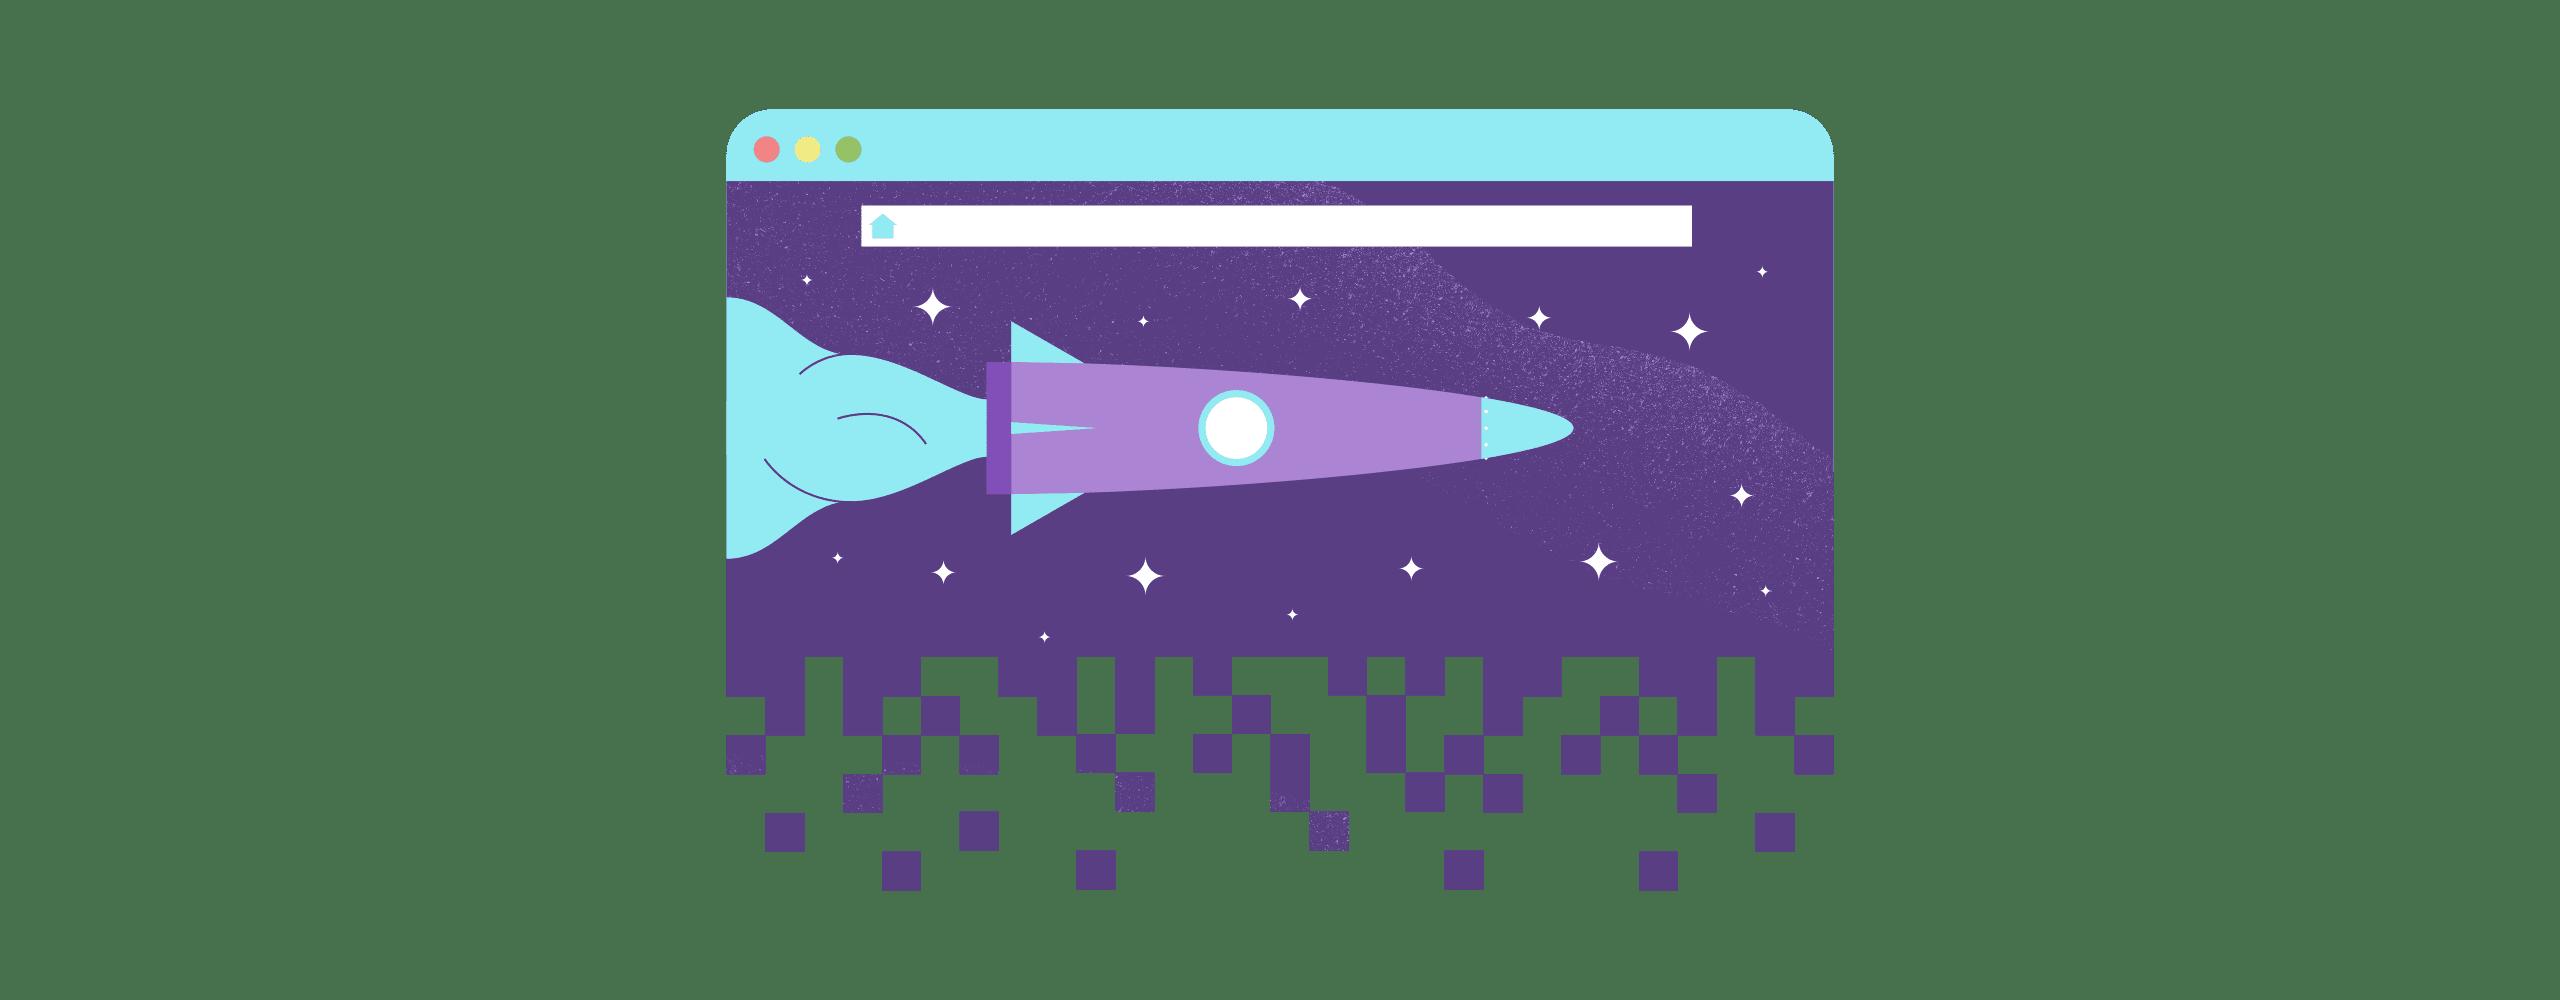 webperformance